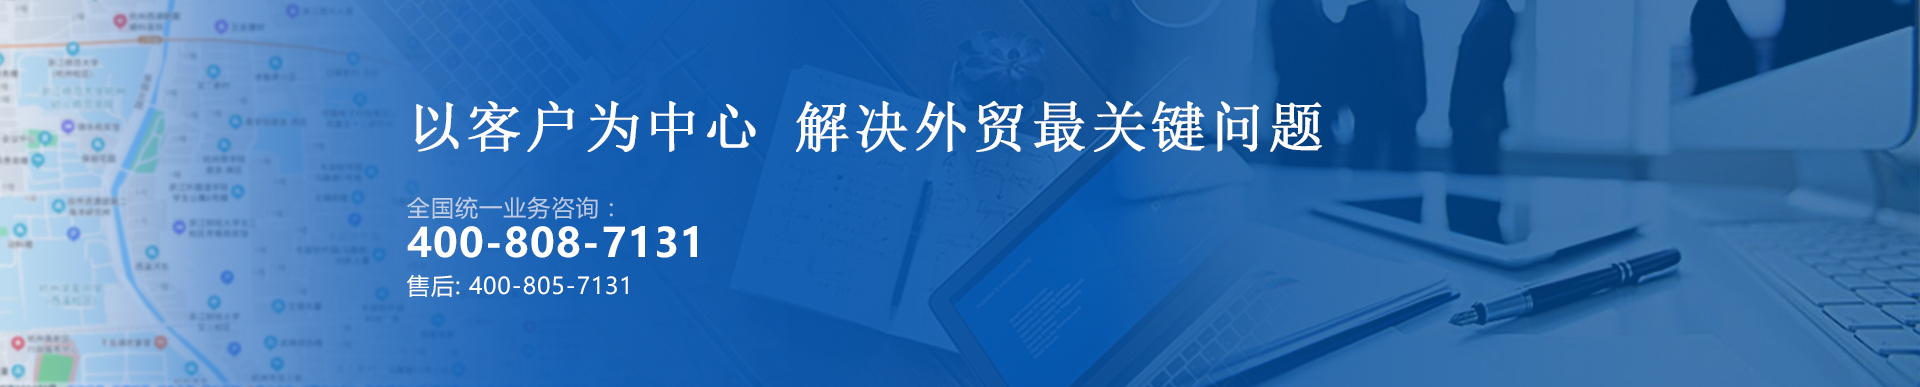 http://www.entersoft.cn/upload/2021/06/15/16237221421145muefn.jpg